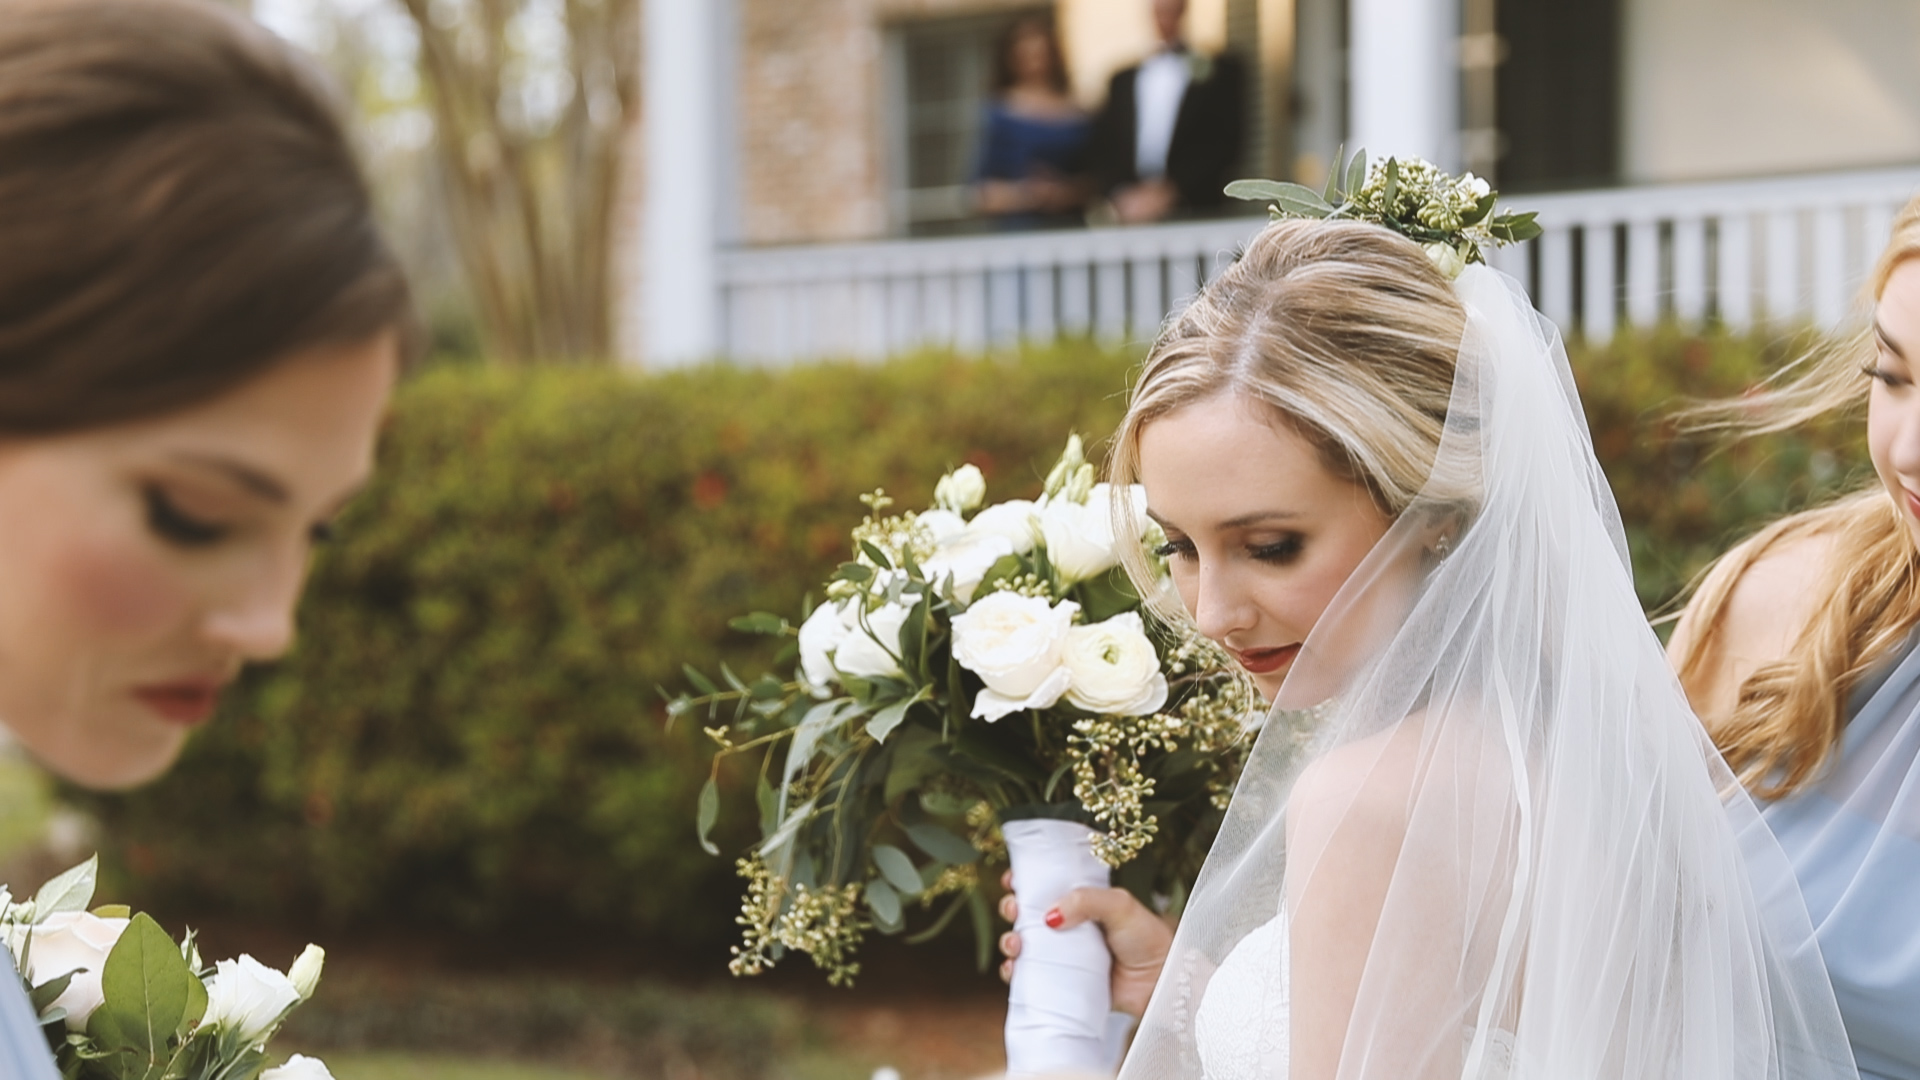 Wedding Day - Bride Film